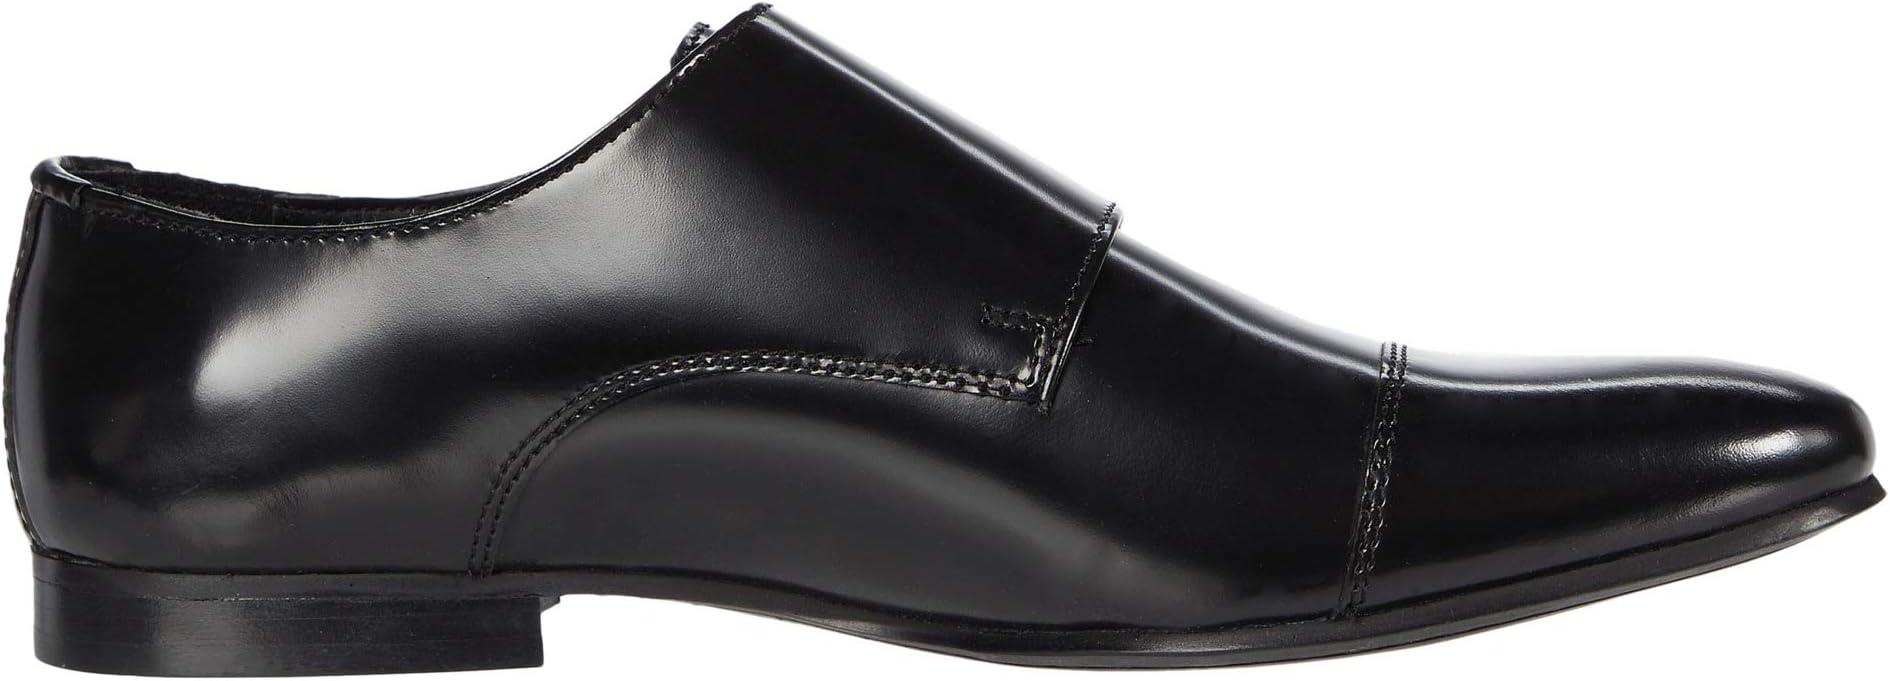 WALK London Luca Monk   Men's shoes   2020 Newest